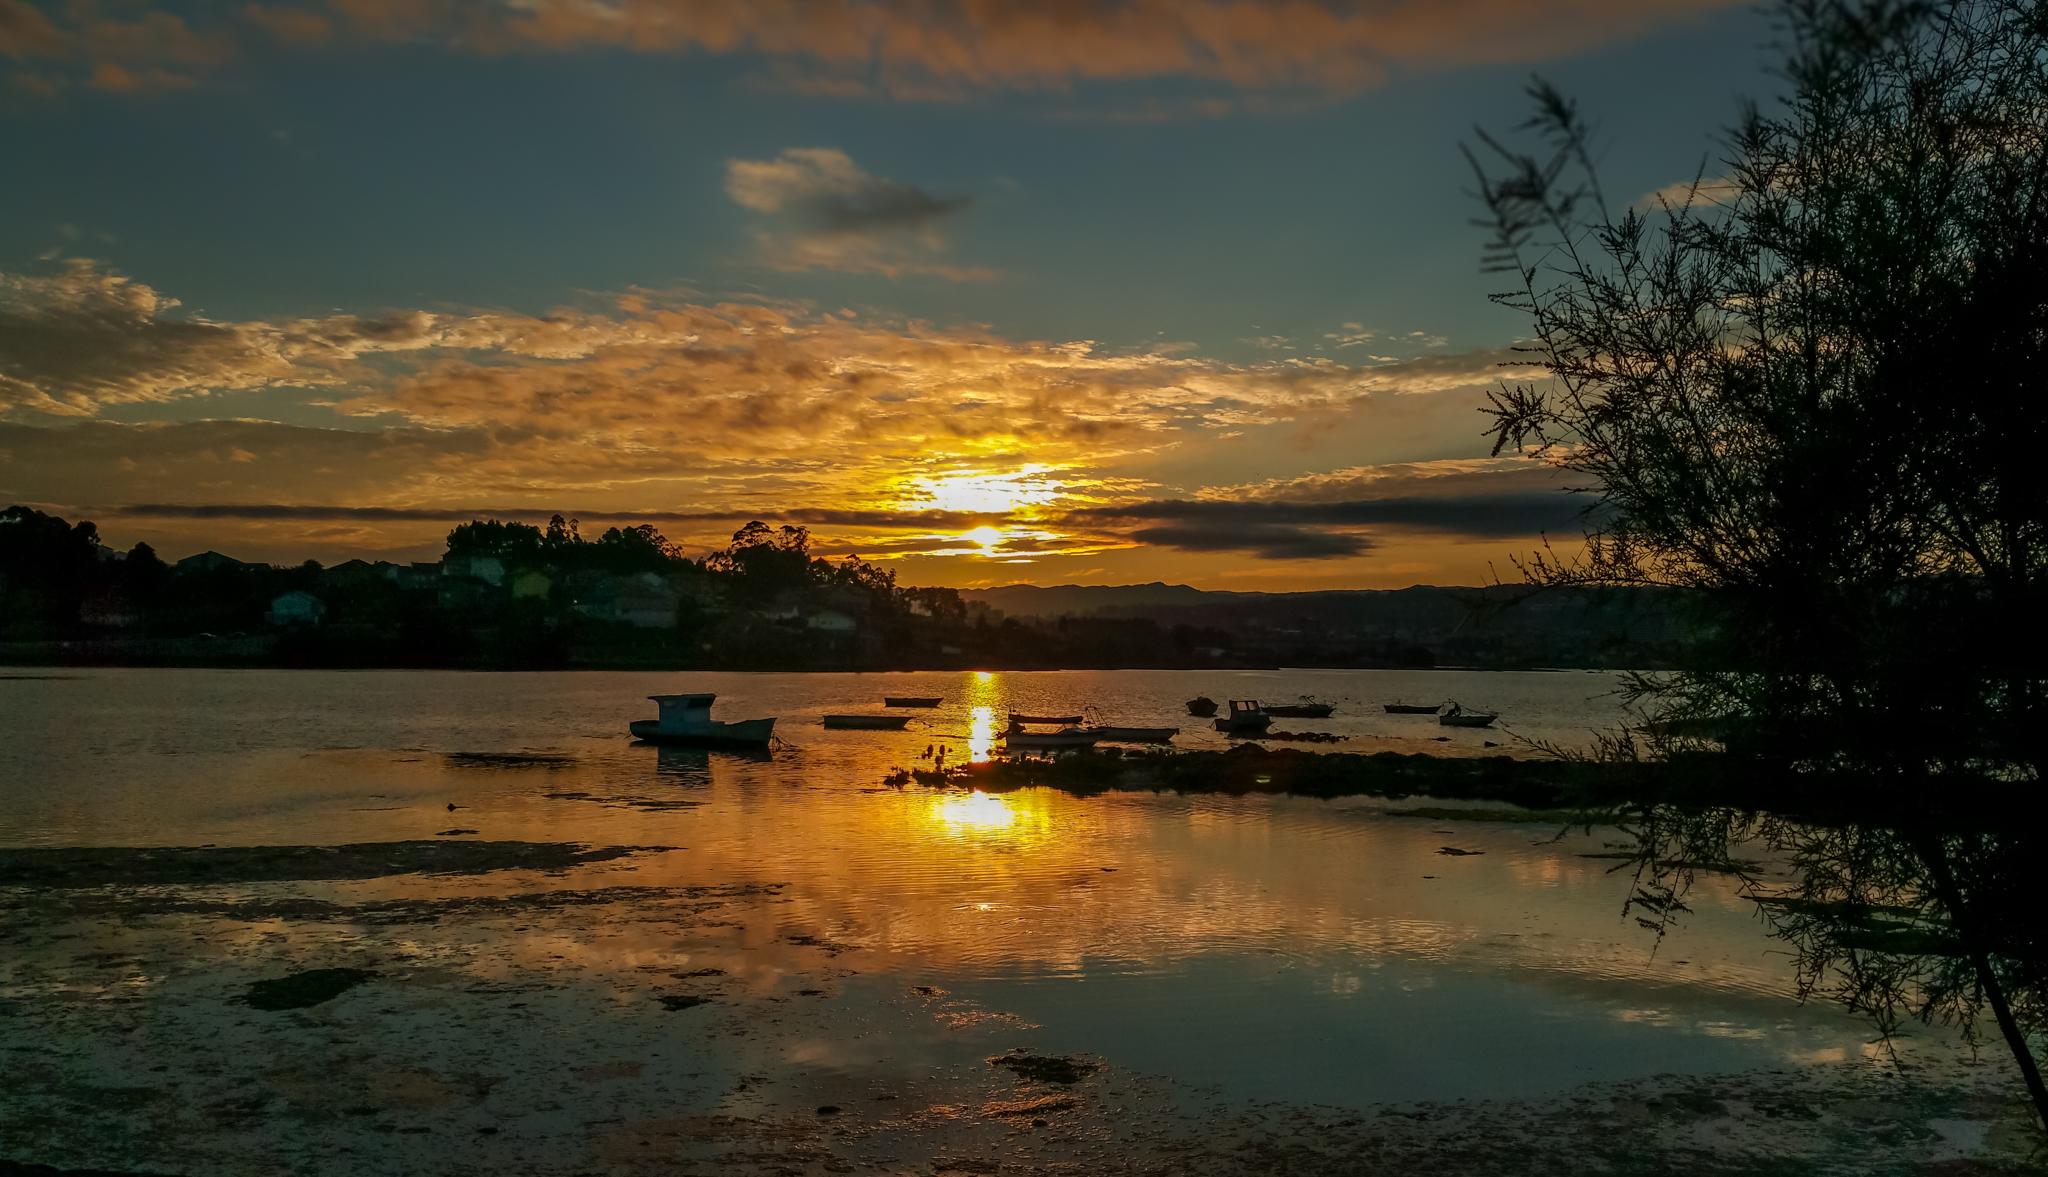 Buenos días, tardes, noches. - Página 2 Landscape-sea-nature-cloud-sky-sun-sunrise-sunset-sunlight-morning-lake-dawn-river-dusk-evening-reflection-spain-galicia-pontevedra-paisajes-amanecer-loch-espana-ggl1-gaby1-xovesphoto-lourido-samsunggalaxynote4-afterglow-404673